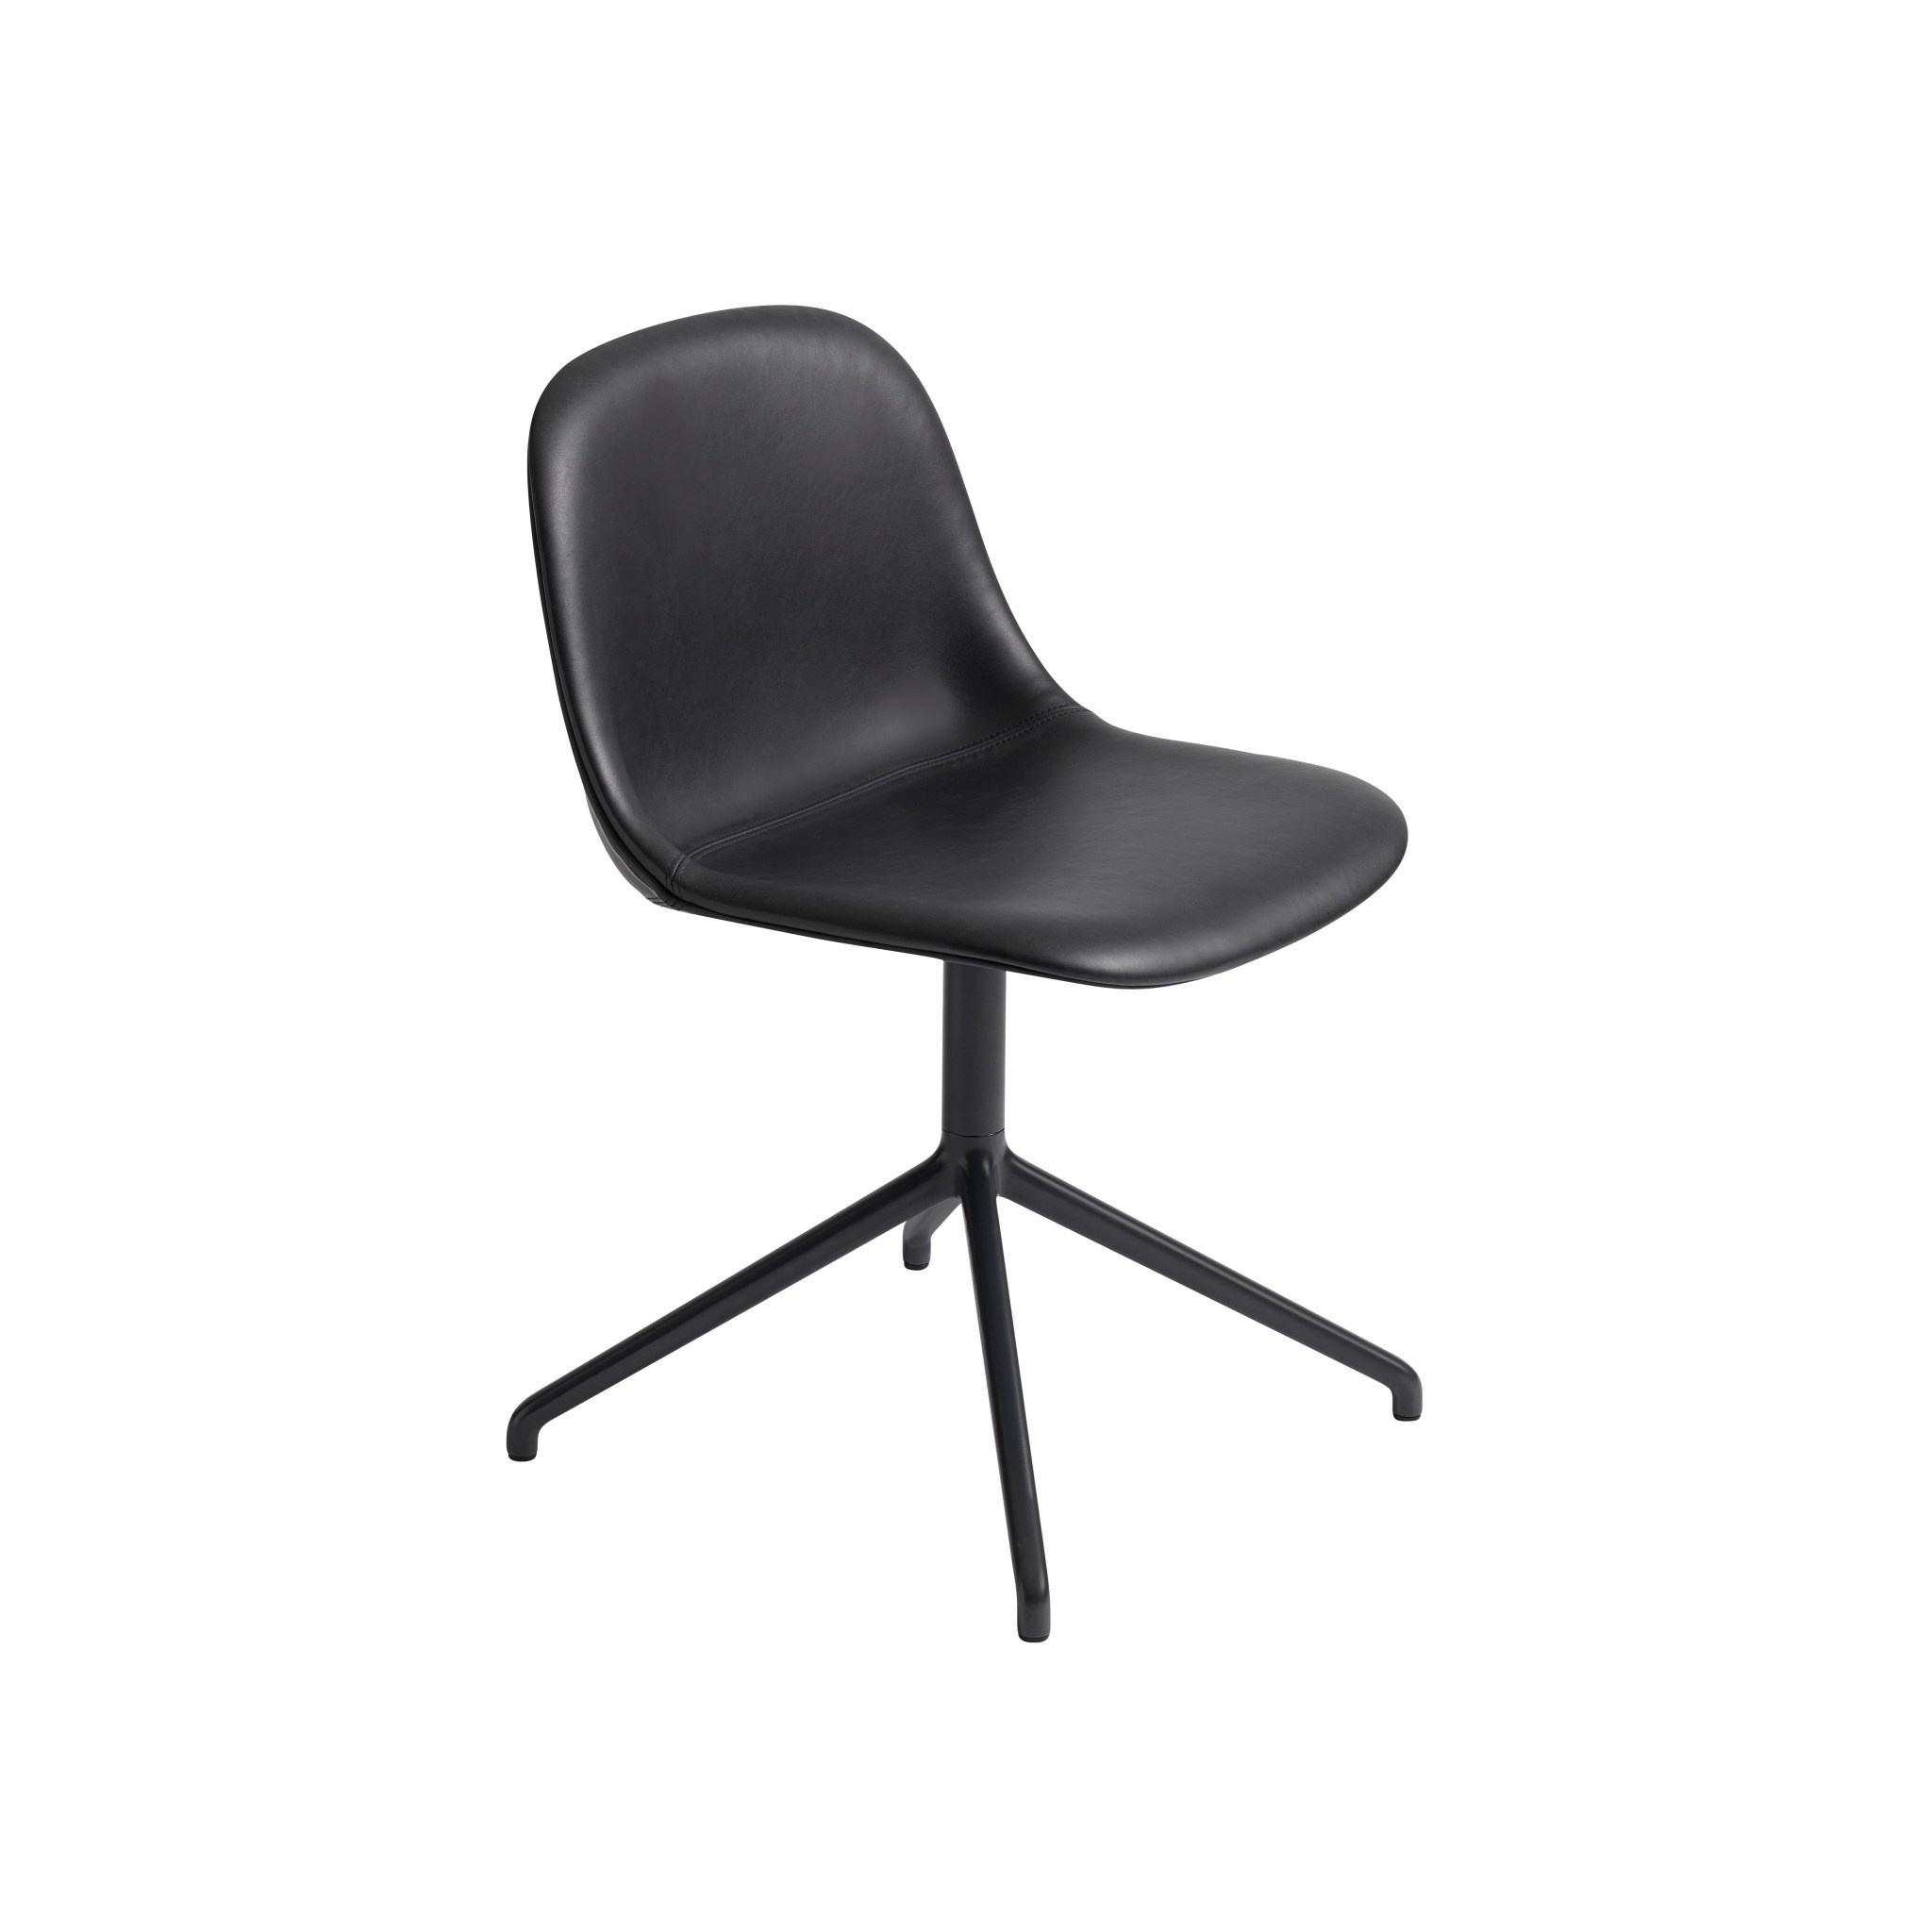 Fiber side chair swivel base w.o. return-12